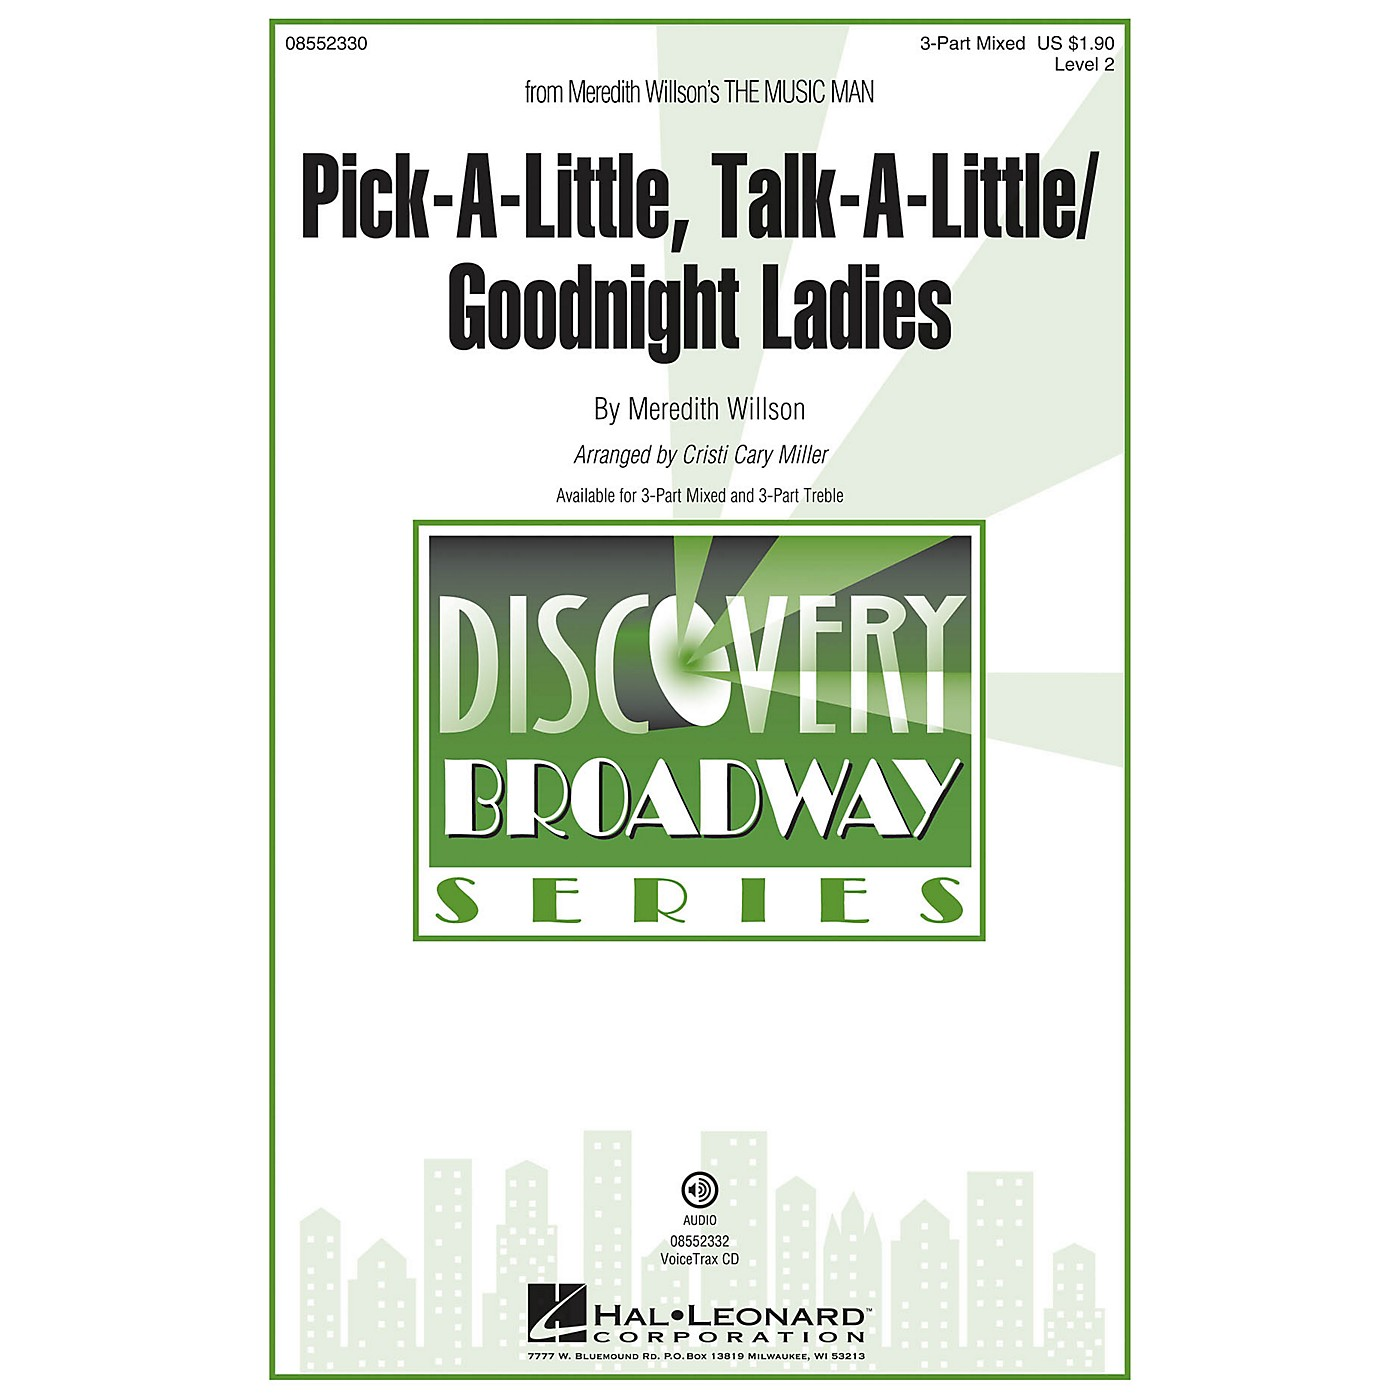 Hal Leonard Pick-a-little, Talk-a-little/Goodnight Ladies VoiceTrax CD Arranged by Cristi Cary Miller thumbnail